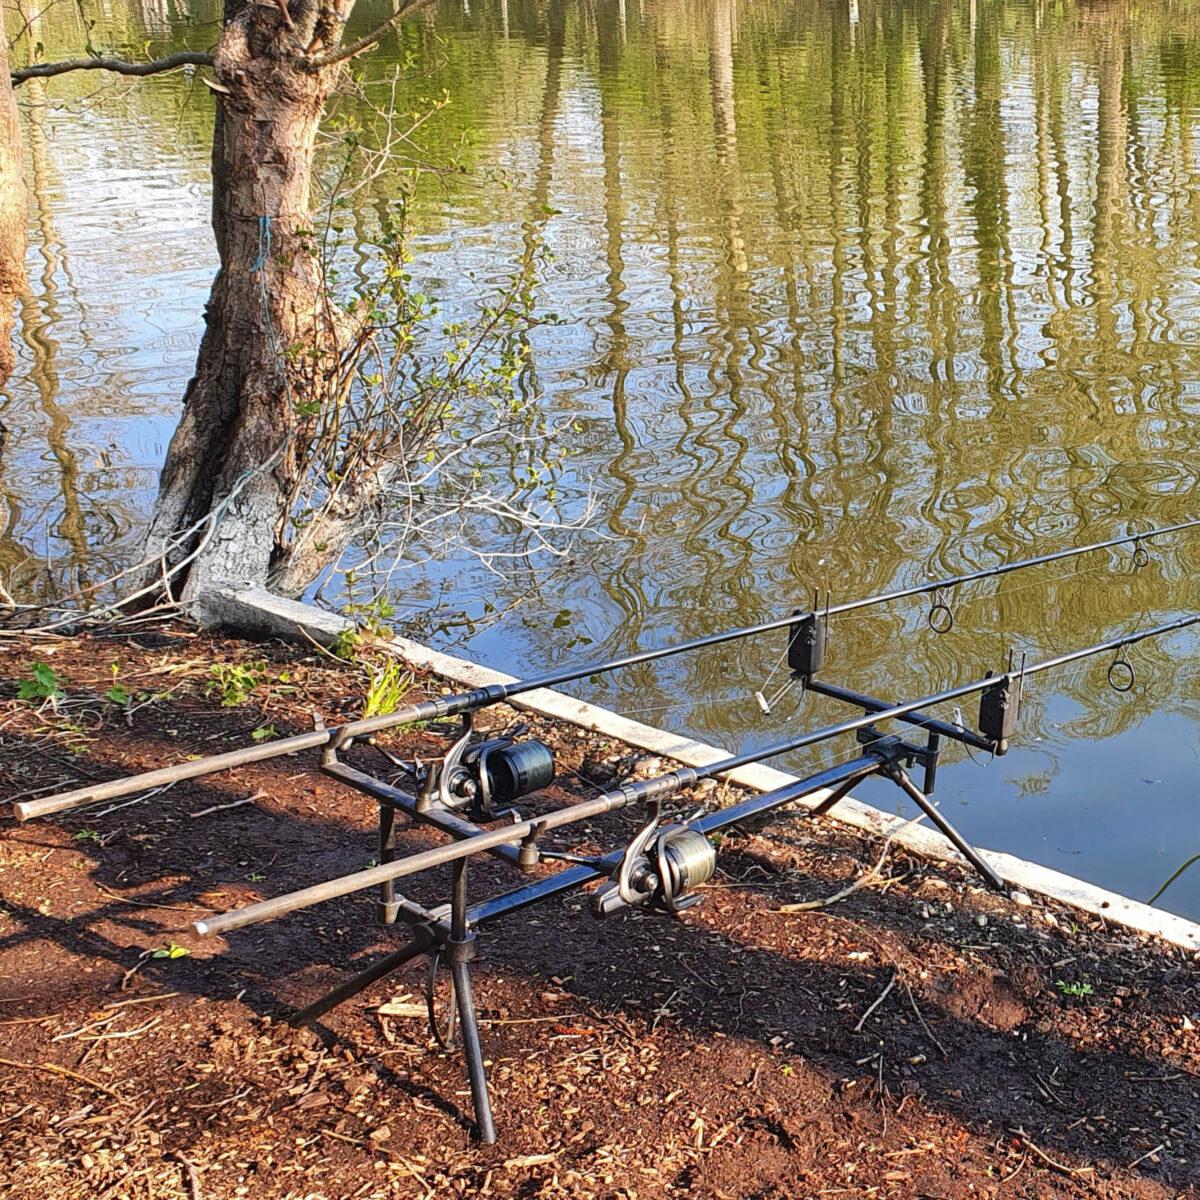 Quest Fishing Adventures - Carp Pike Barbel Chub Perch Bream Roach Gotta Catch Them All 10: Legends Lake 001 / Carp Fishing